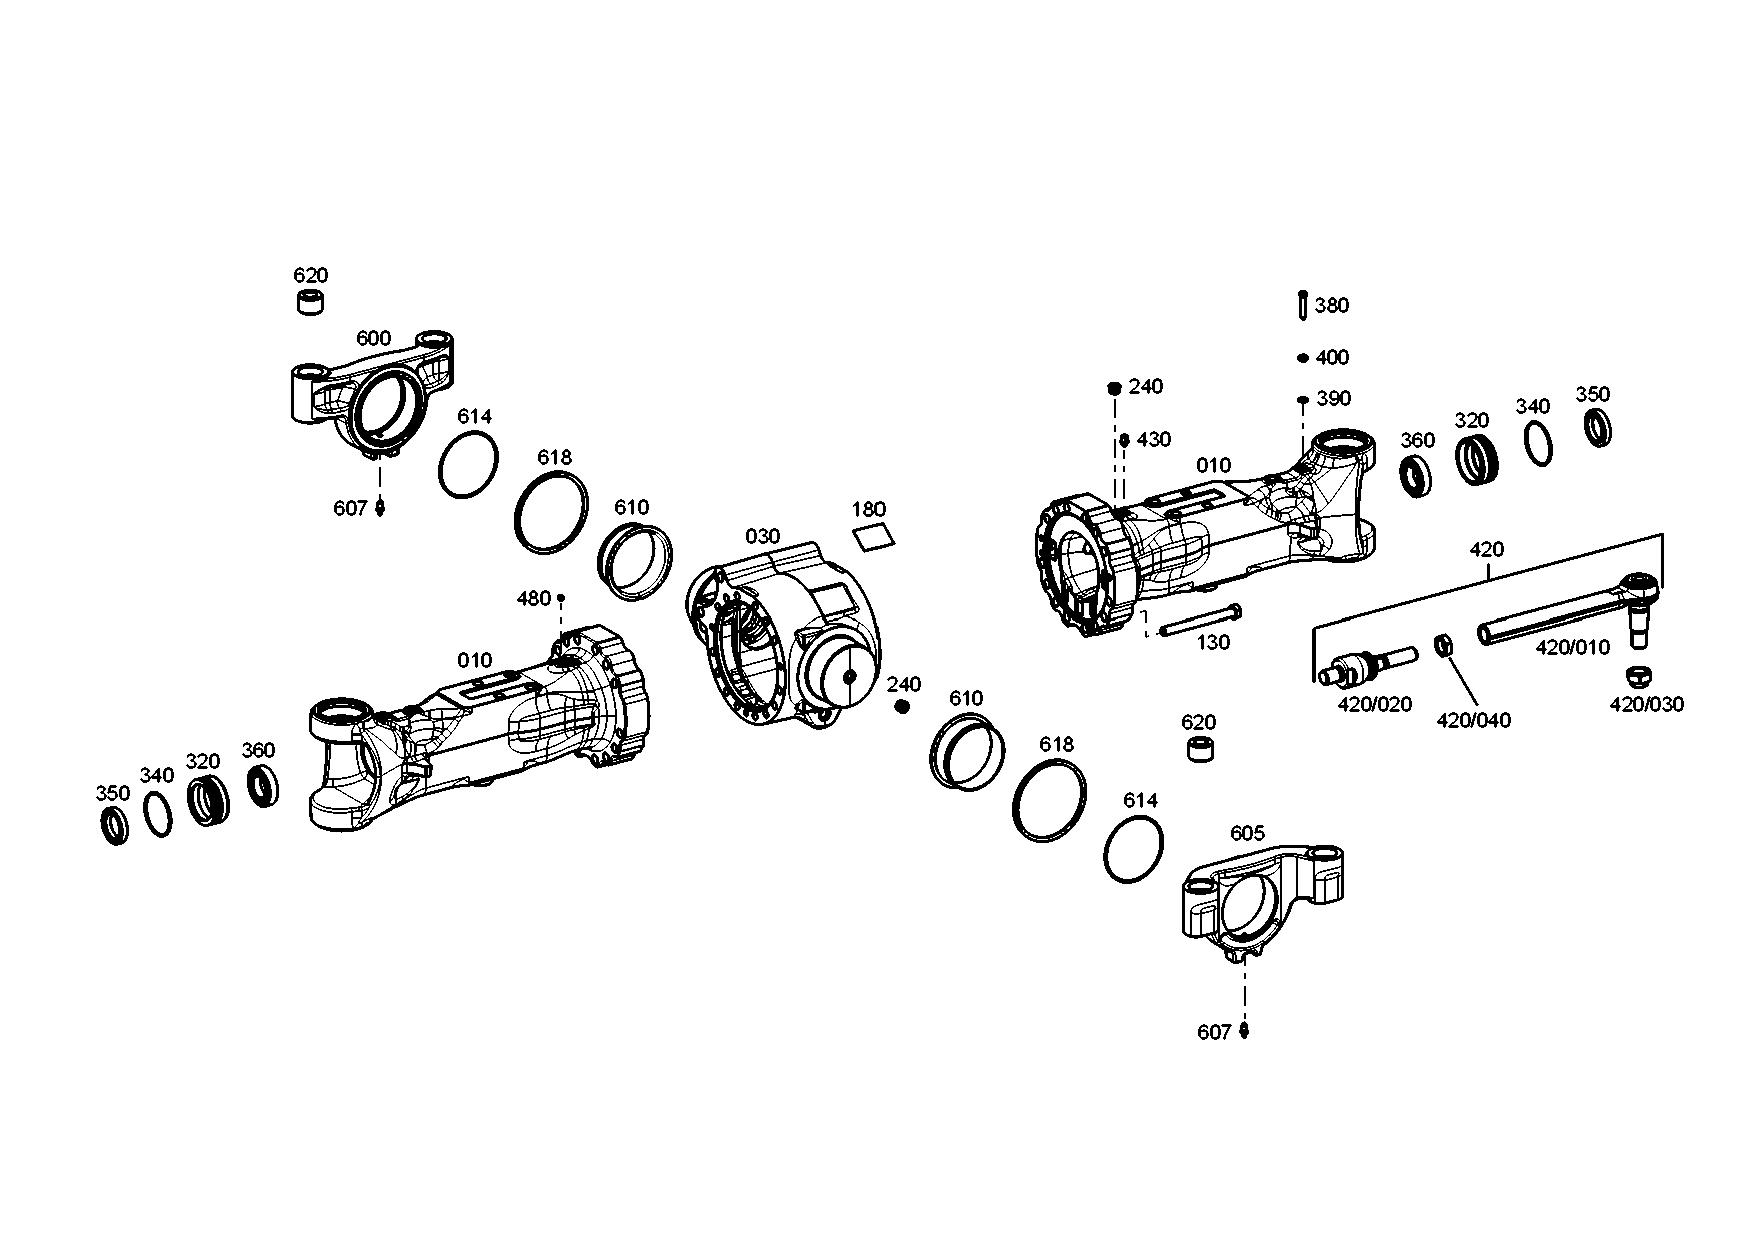 Innen /Ø:123,42mm Schnur/Ø:3,53mm Werkstoff:EPDM 70A EPDM 70A 123,42x3,53 mm O-Ring